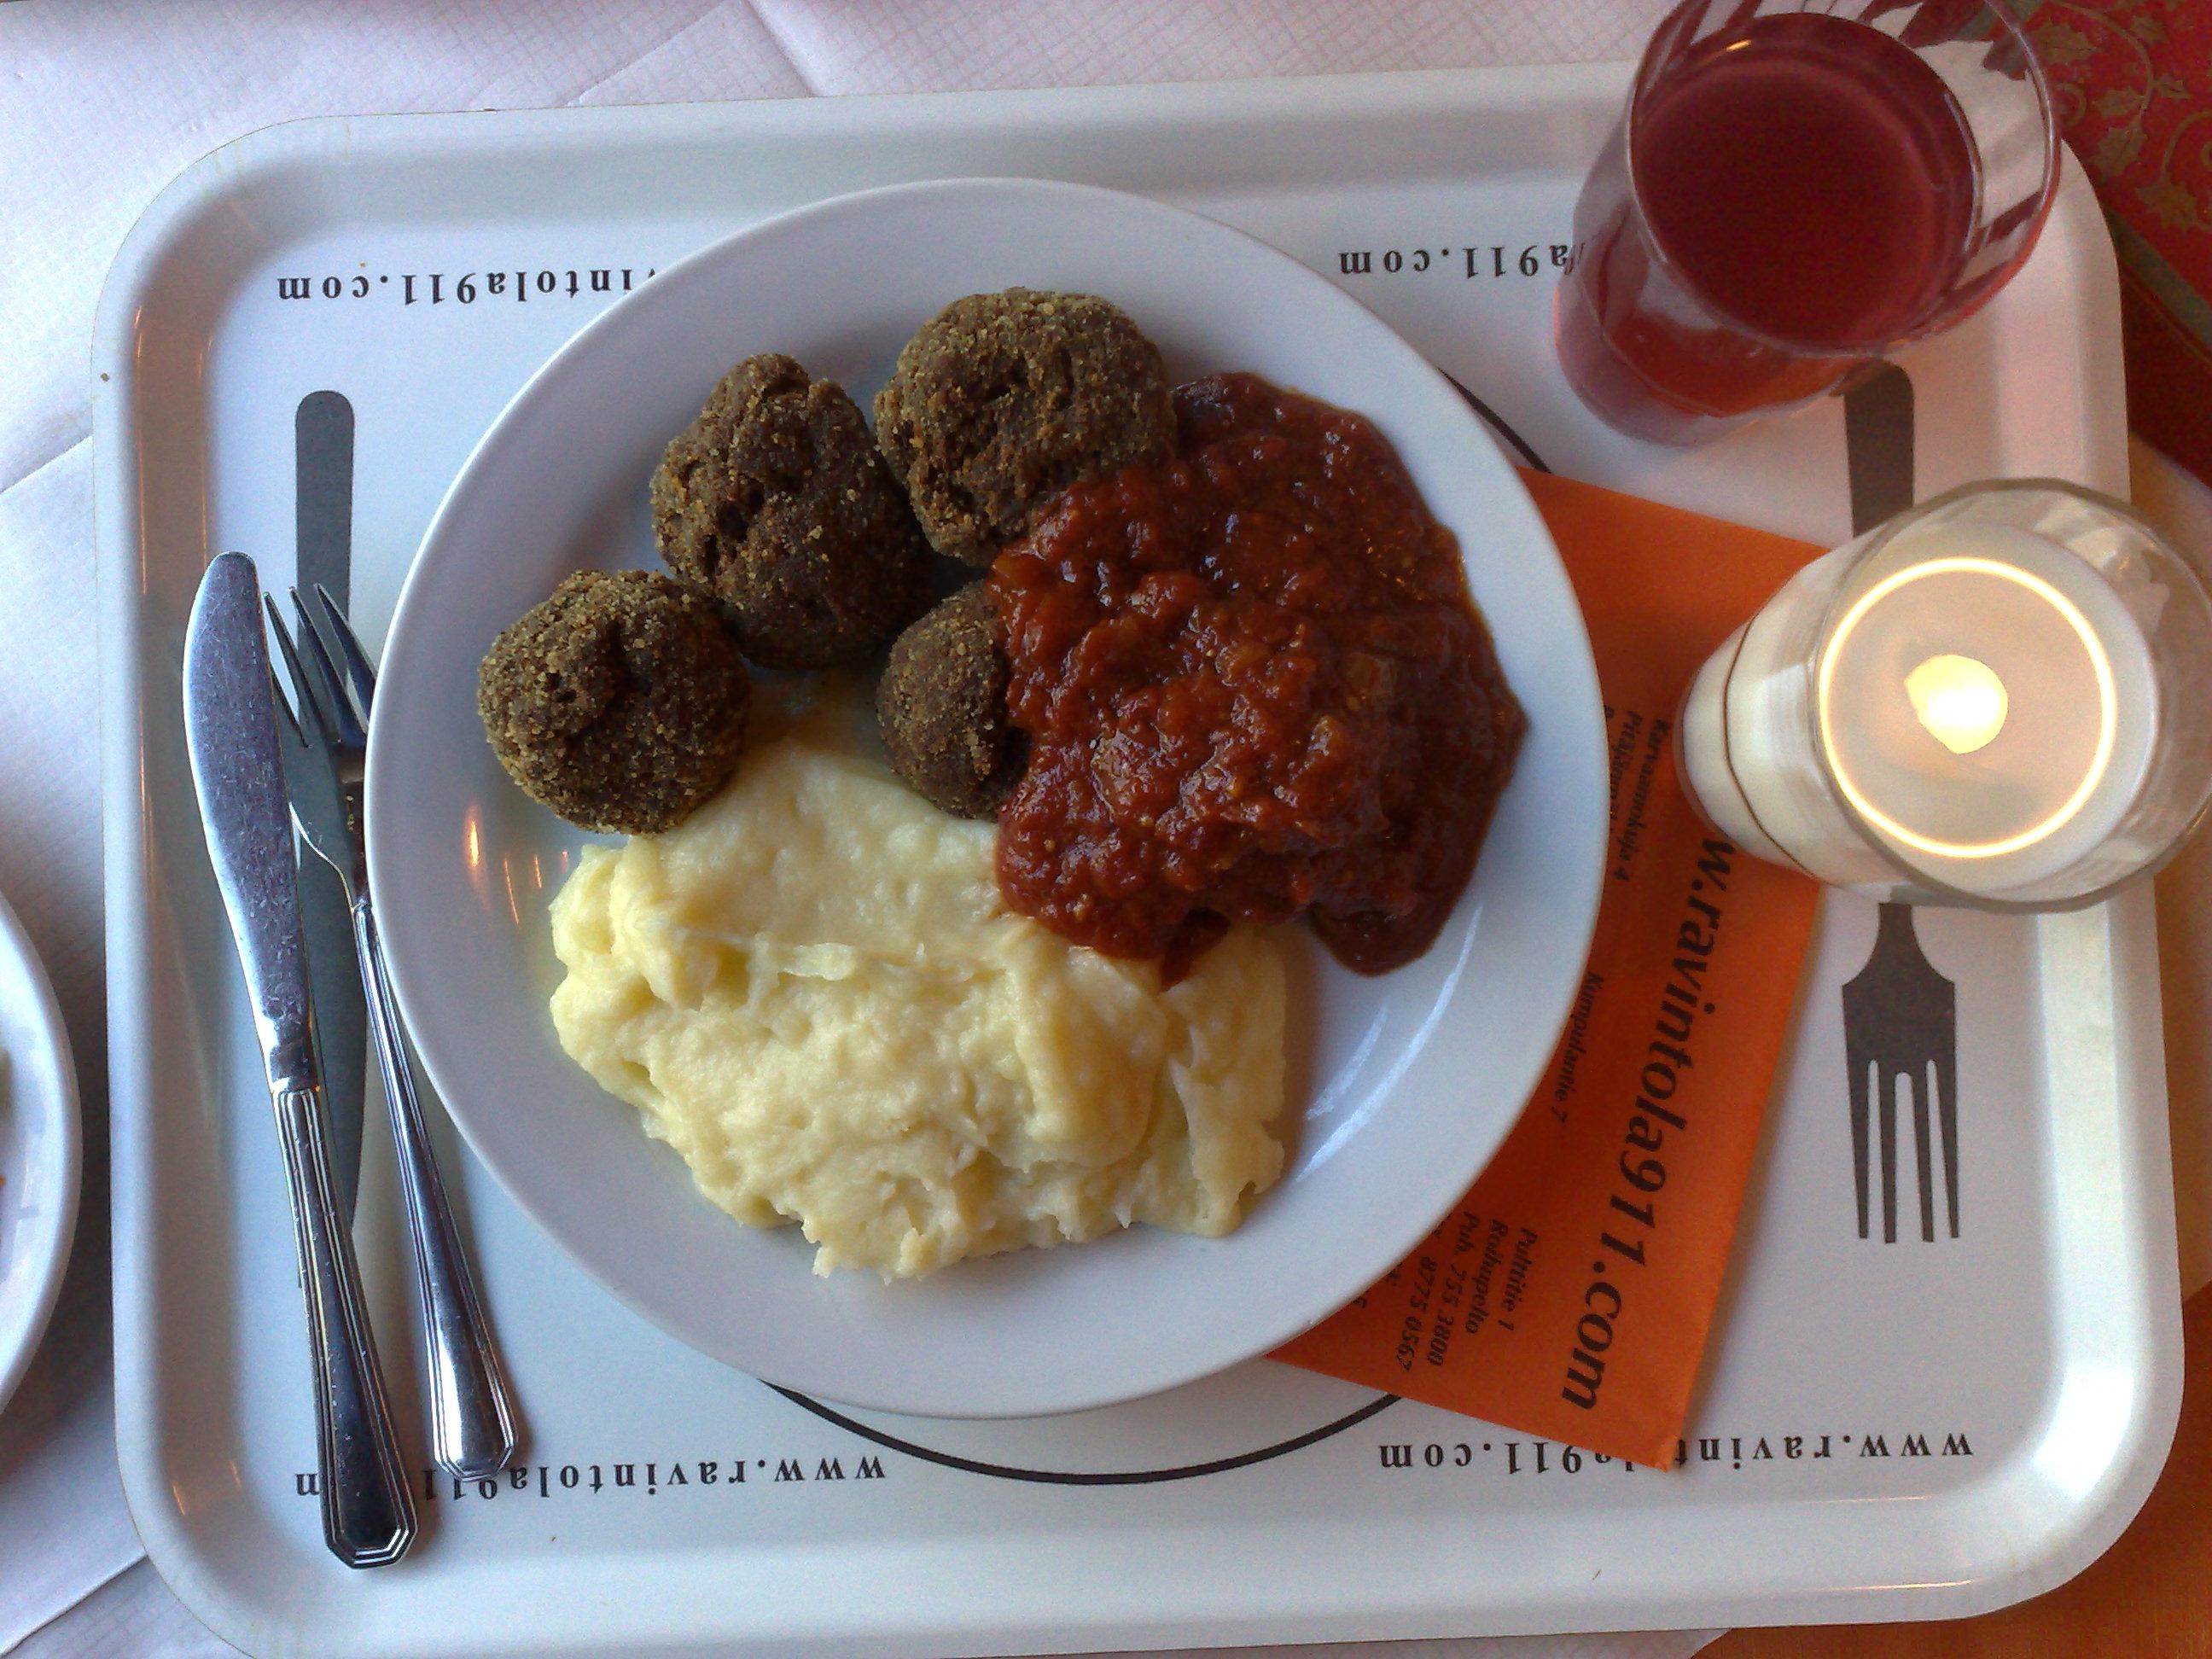 Ravintola 91.1 Kumpulantie, Helsinki: Pullat ja tsilisoosia. Hapanta mehua myös.